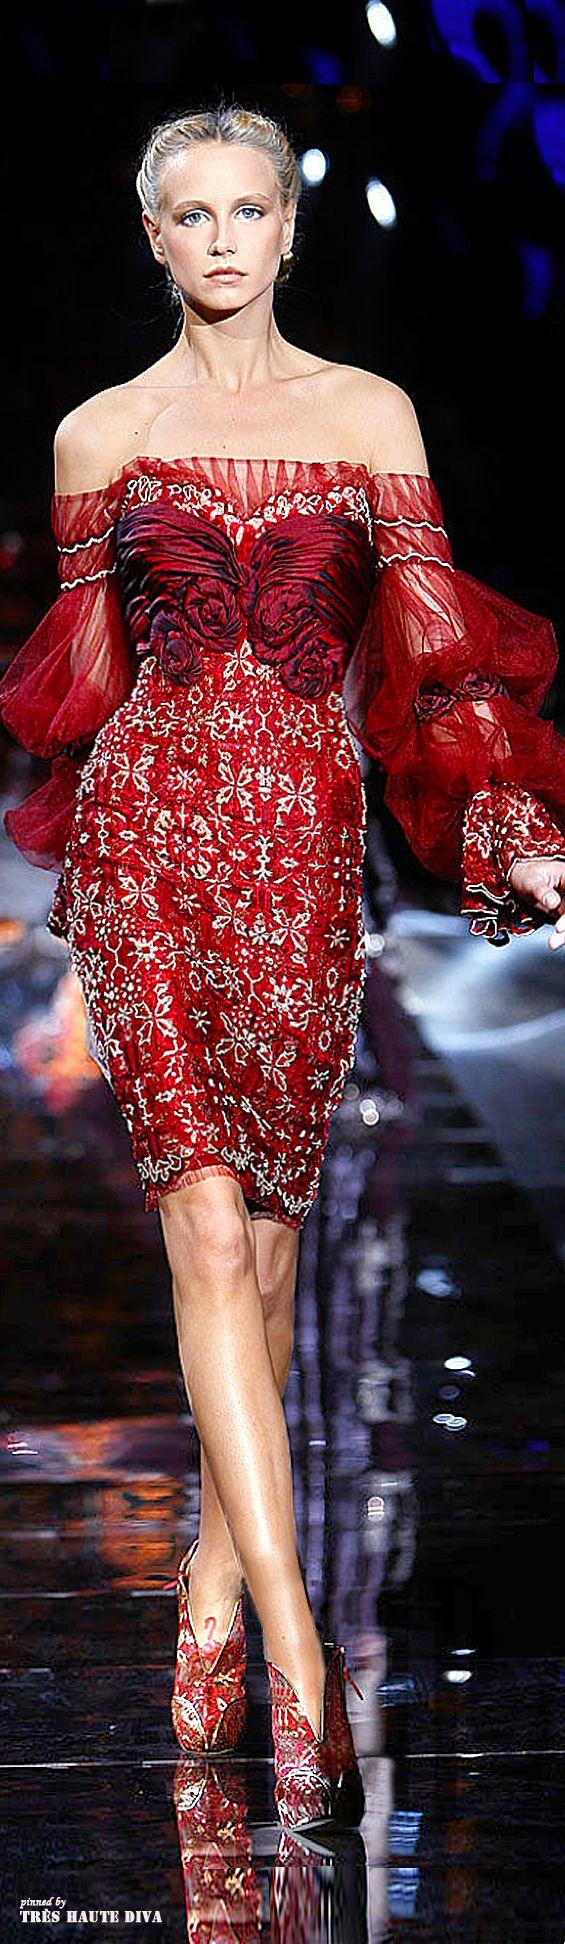 Zuhair Murad Fall/Winter Couture